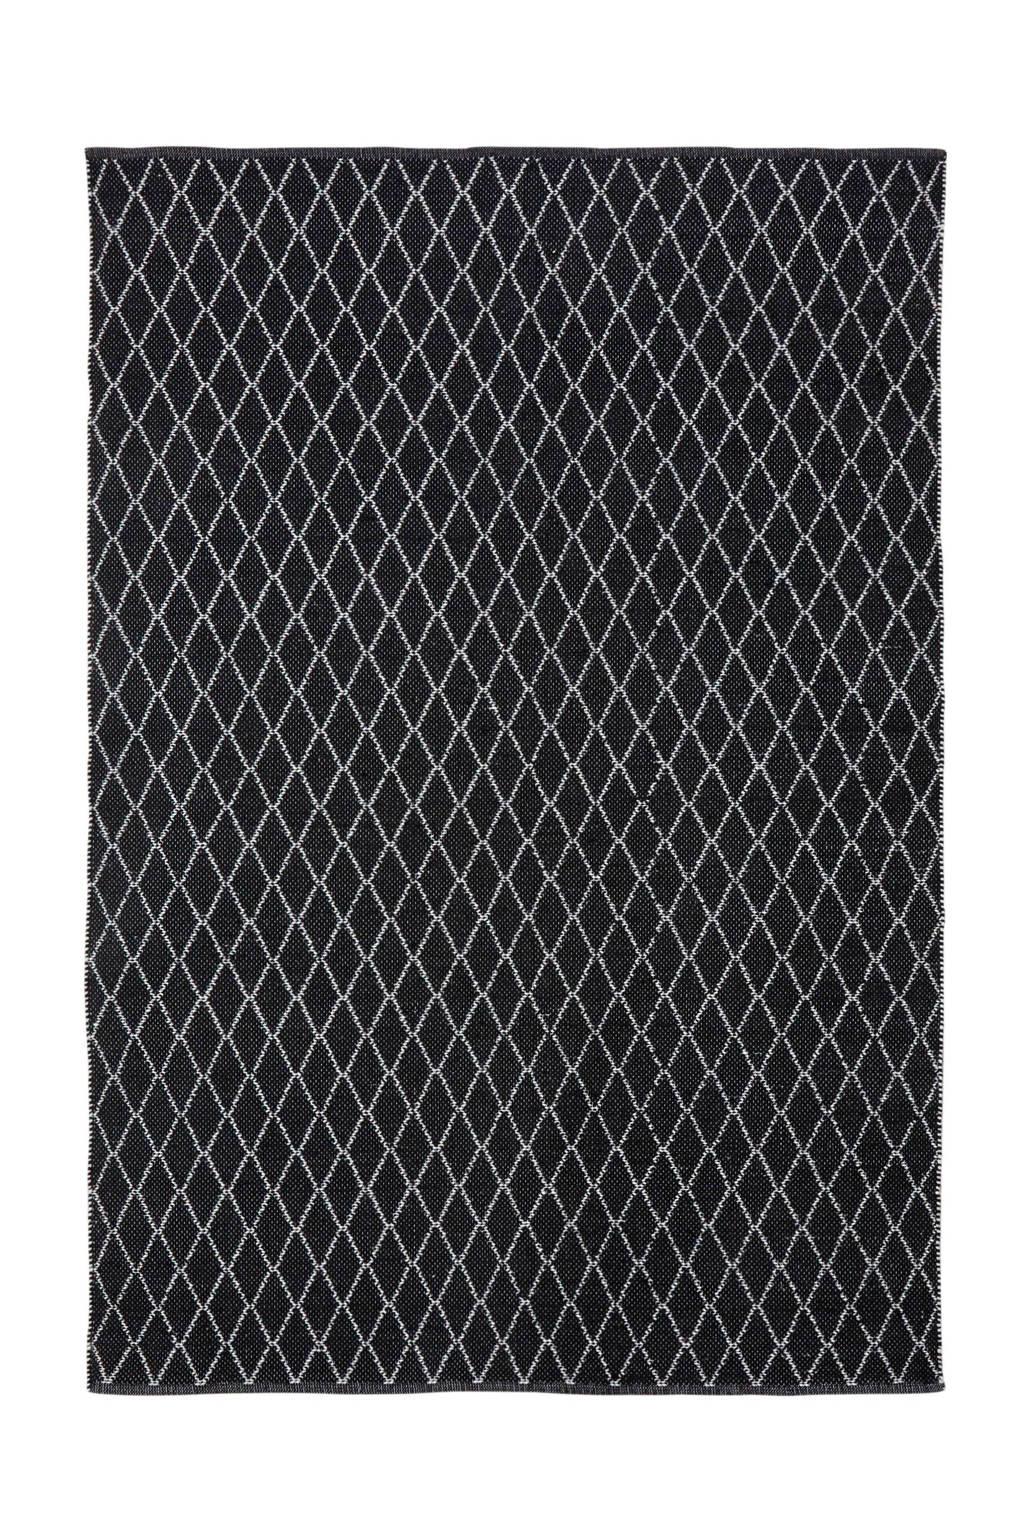 whkmp's own Vloerkleed  (230x160 cm), Zwart/wit